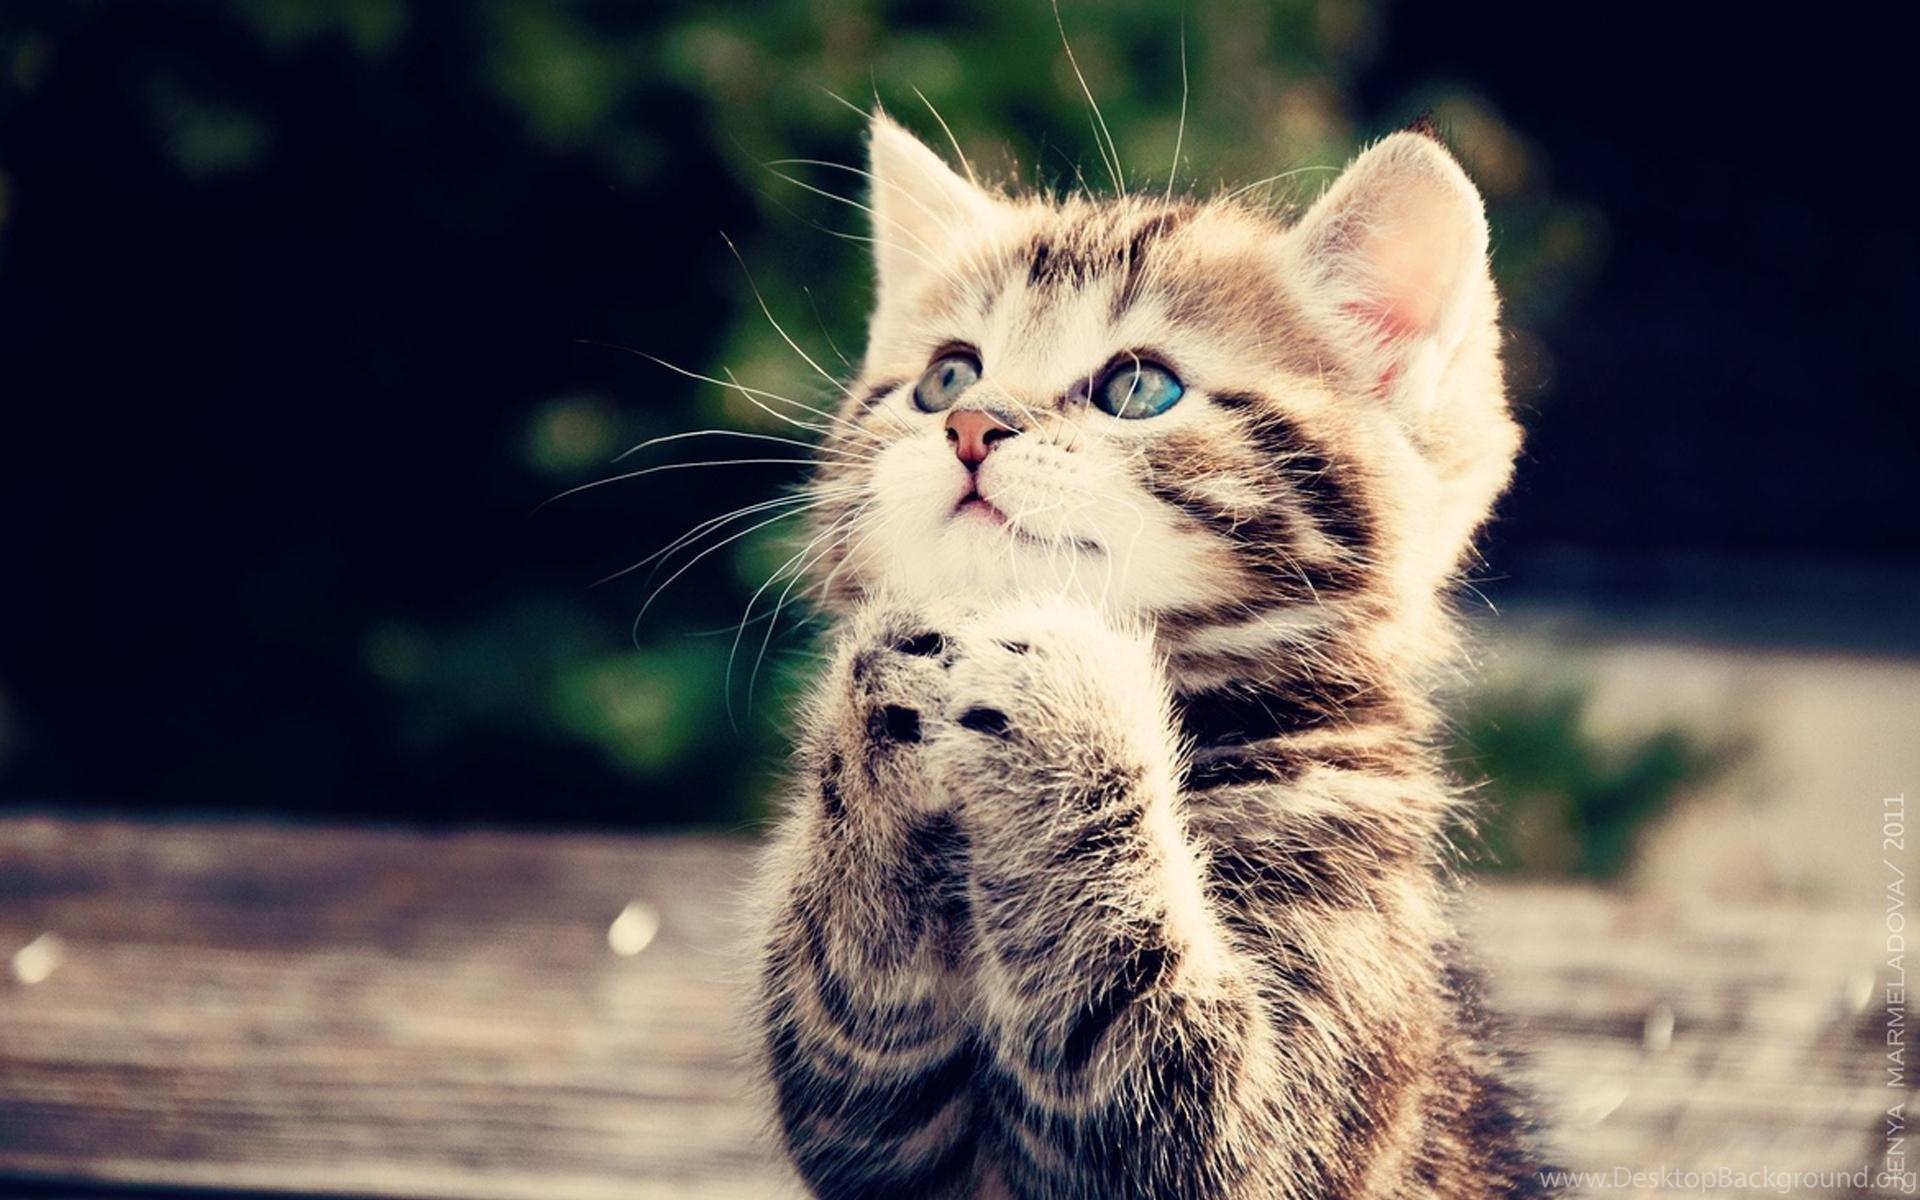 cute baby cats wallpapers for iphone : animal wallpapers rakaruan